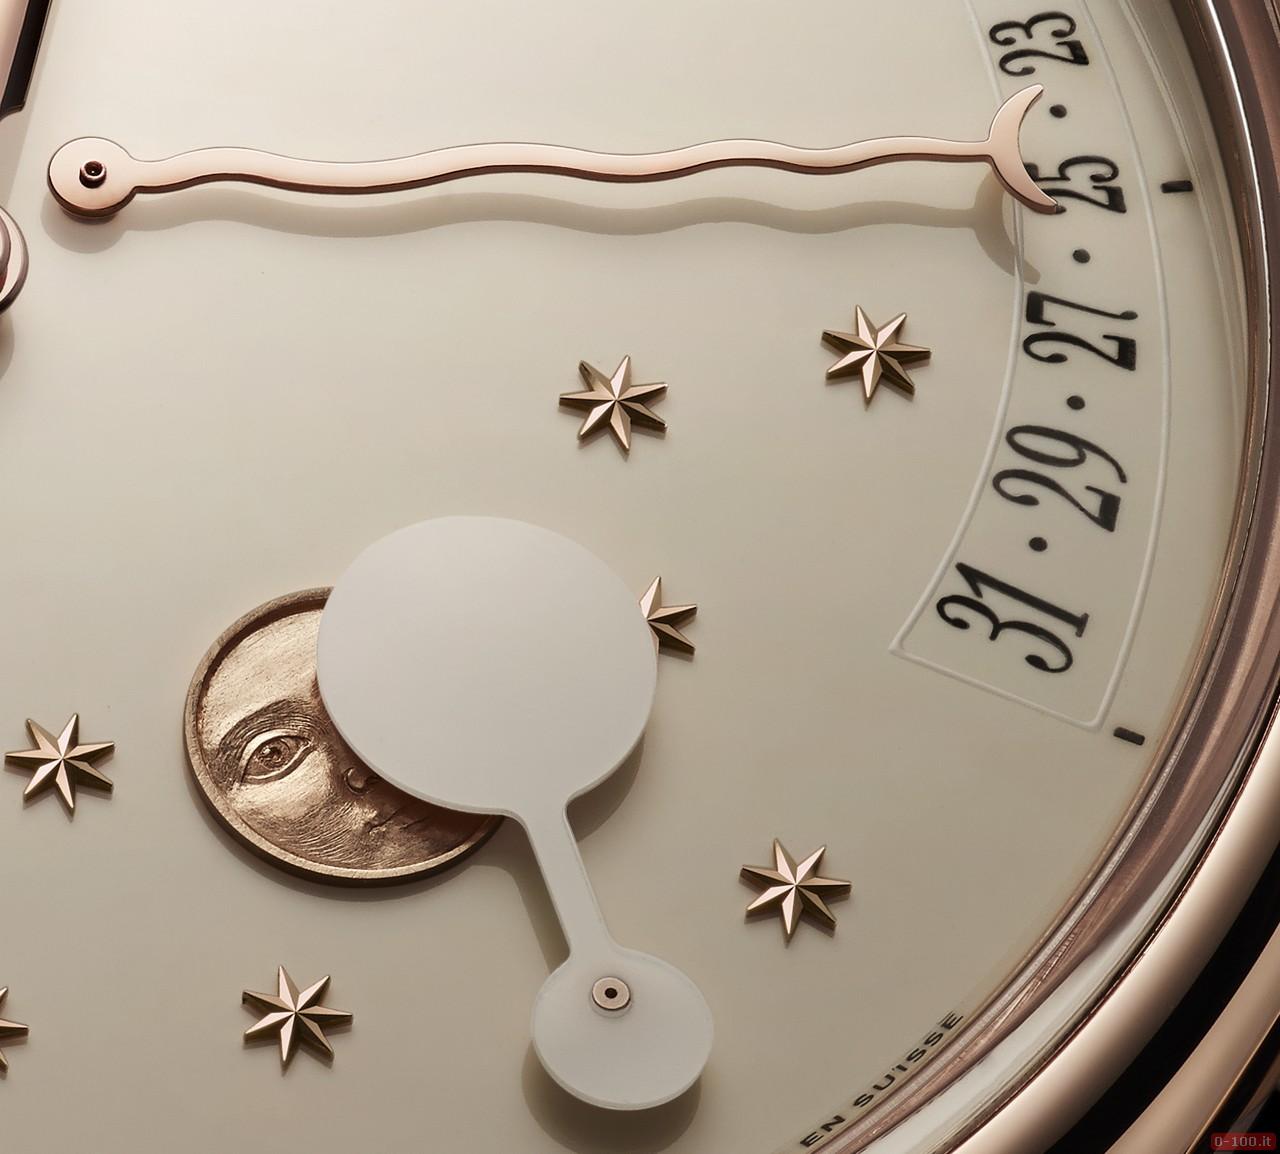 jaquet-droz-perpetual-calendar-eclipse-1008